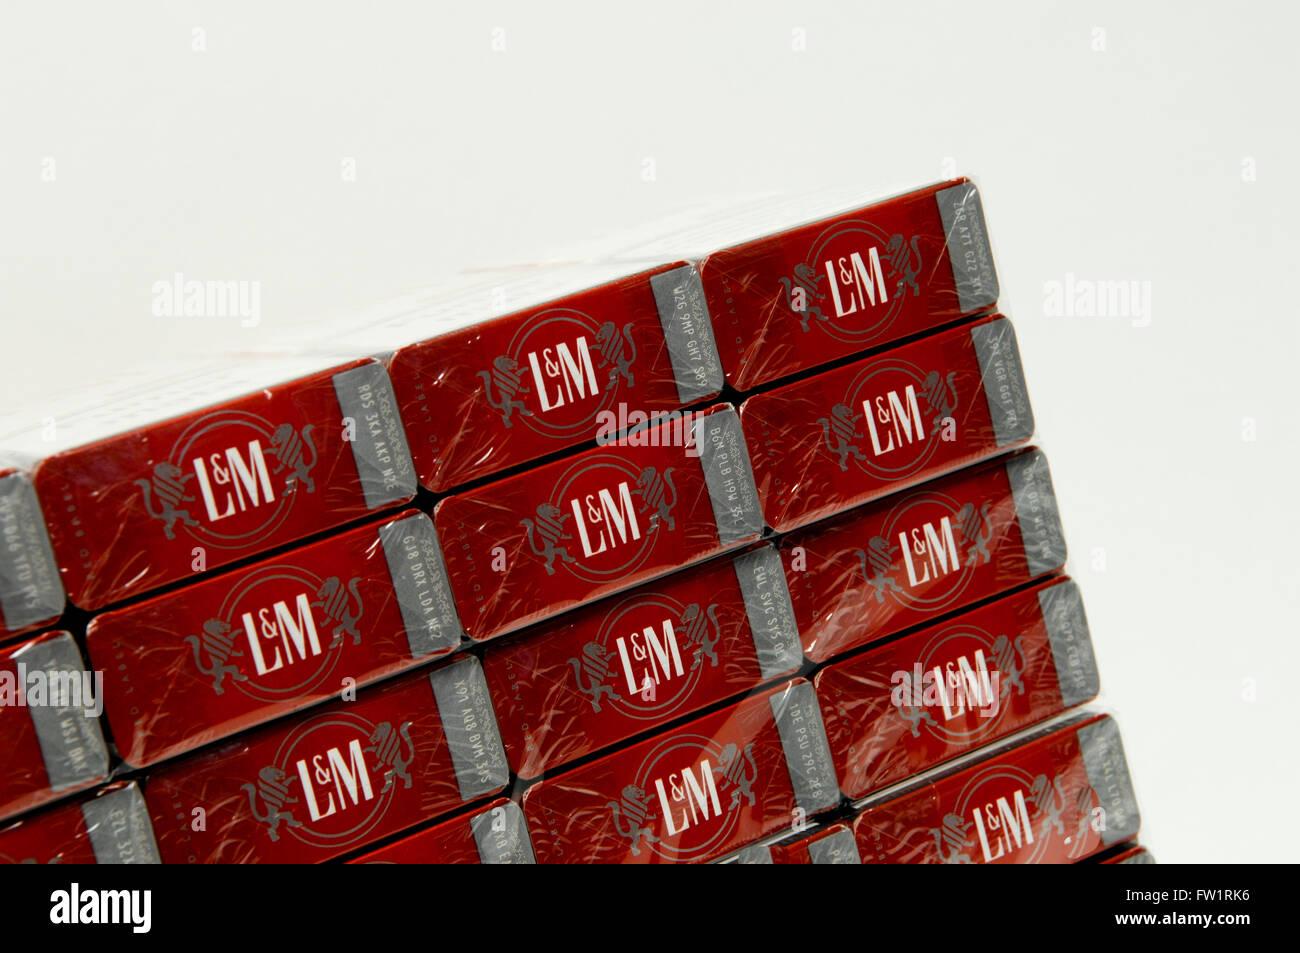 What does menthol cigarettes